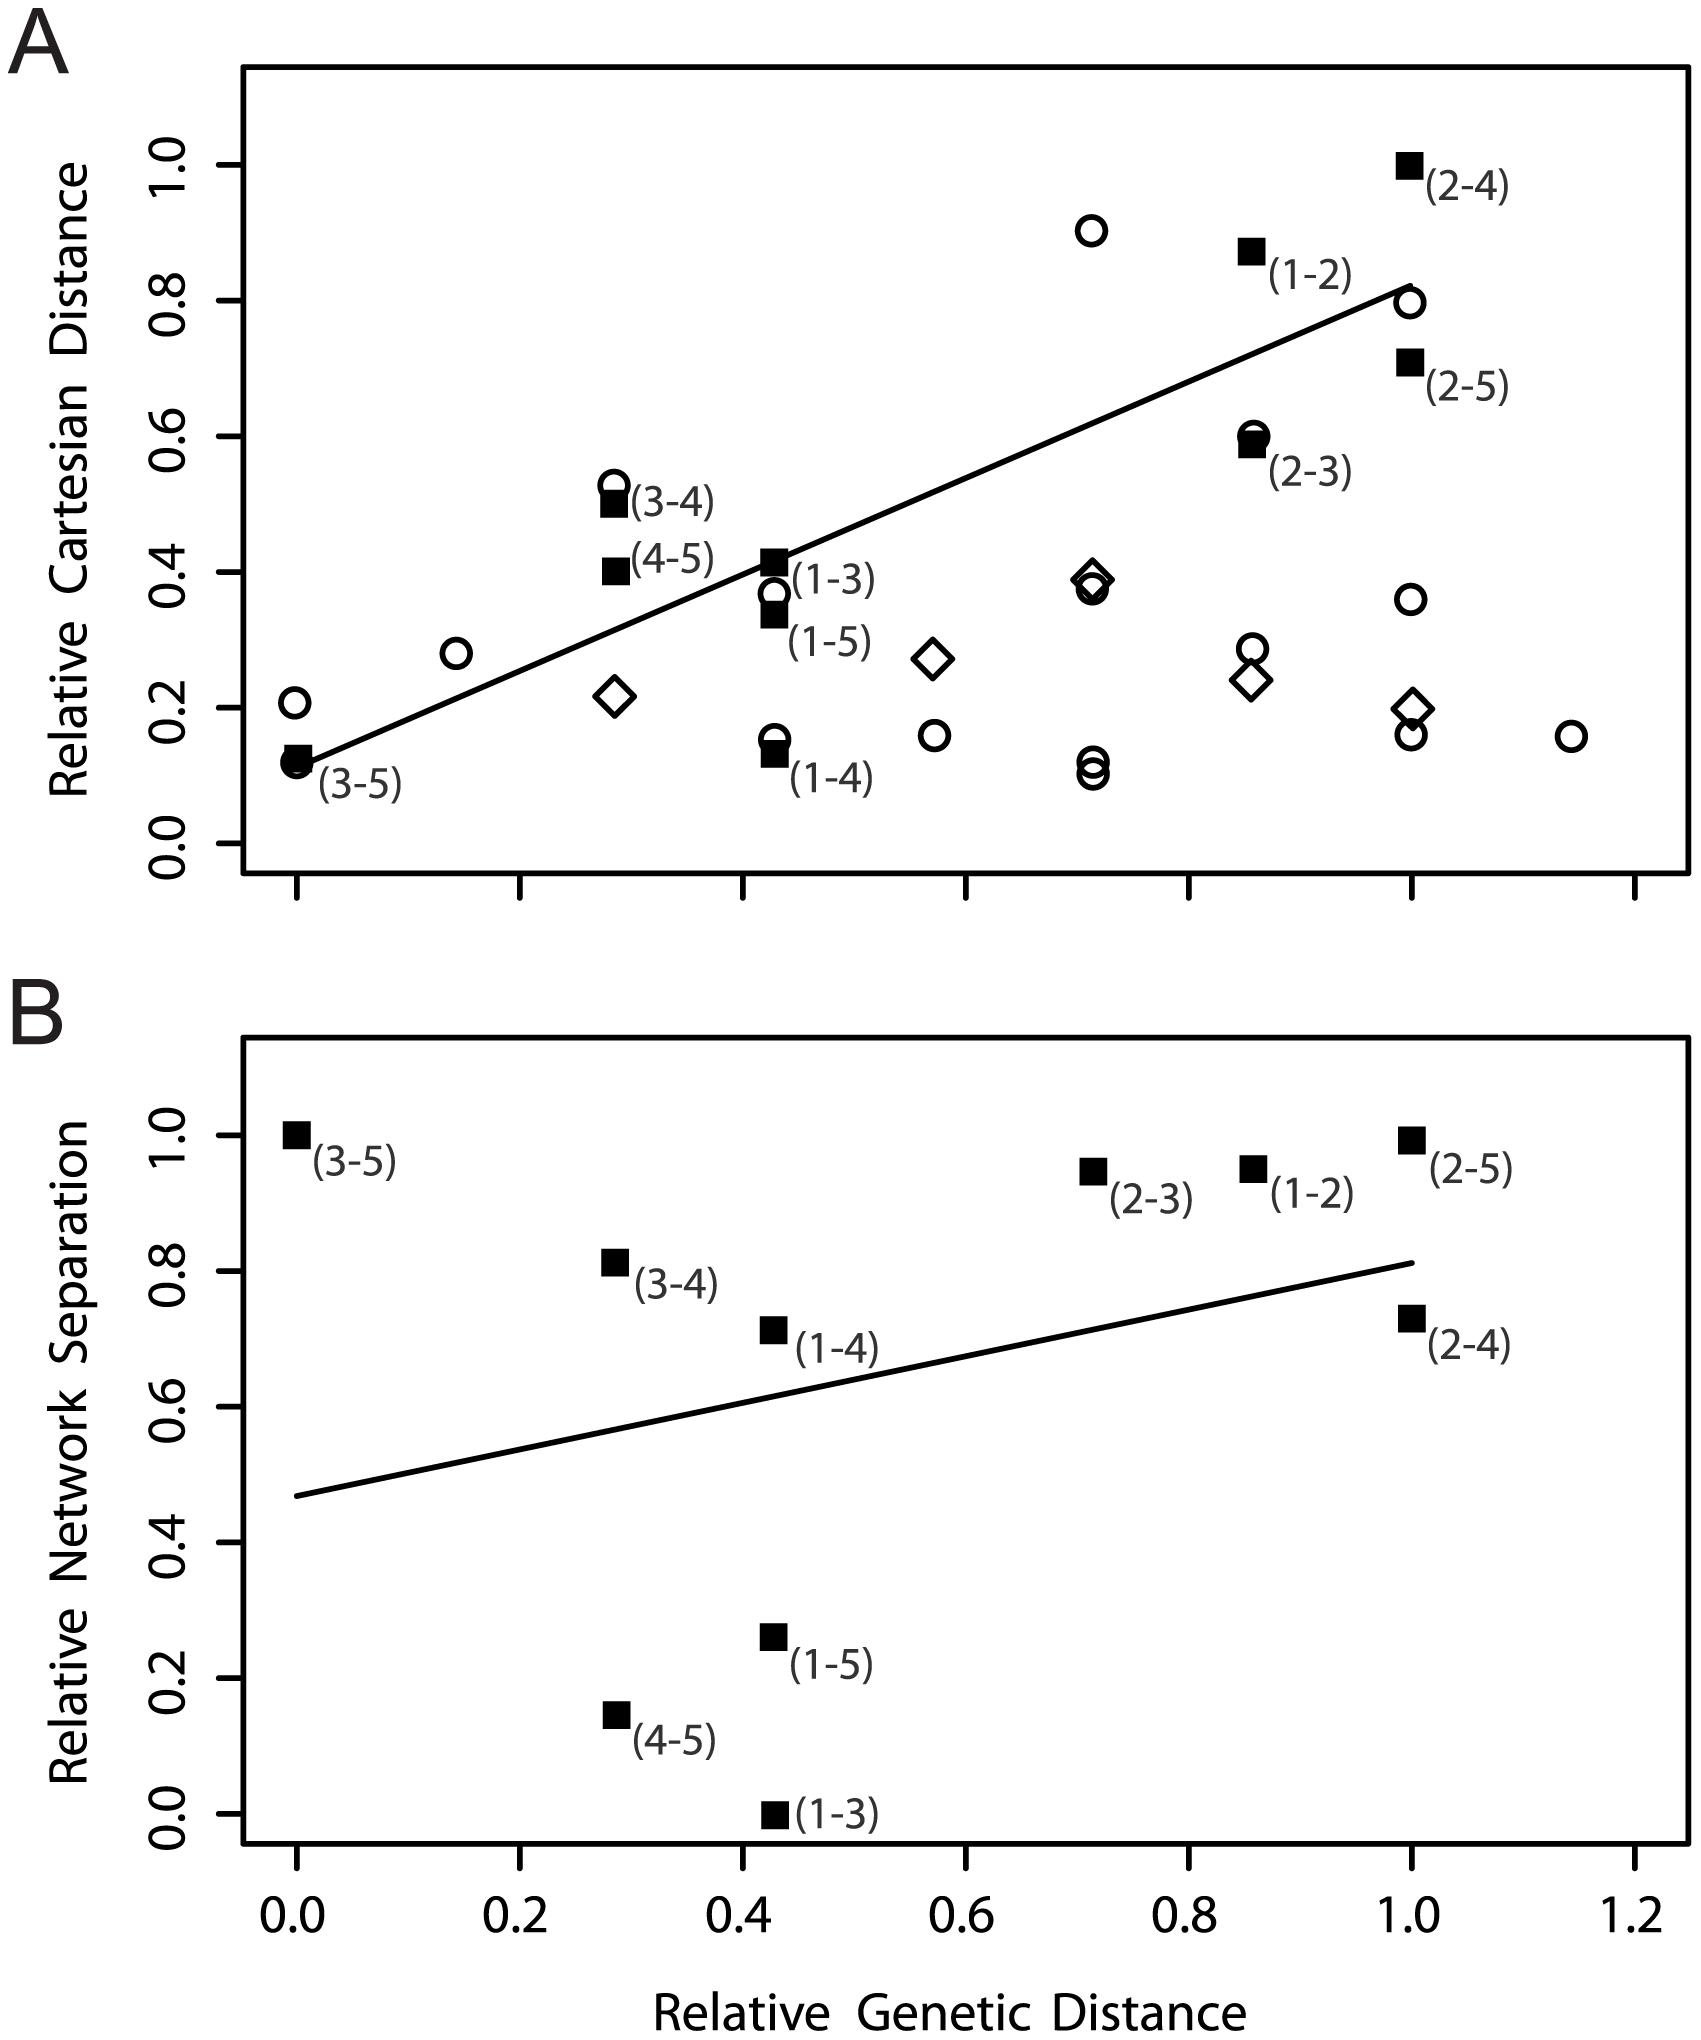 Genetic versus spatial and network distances.